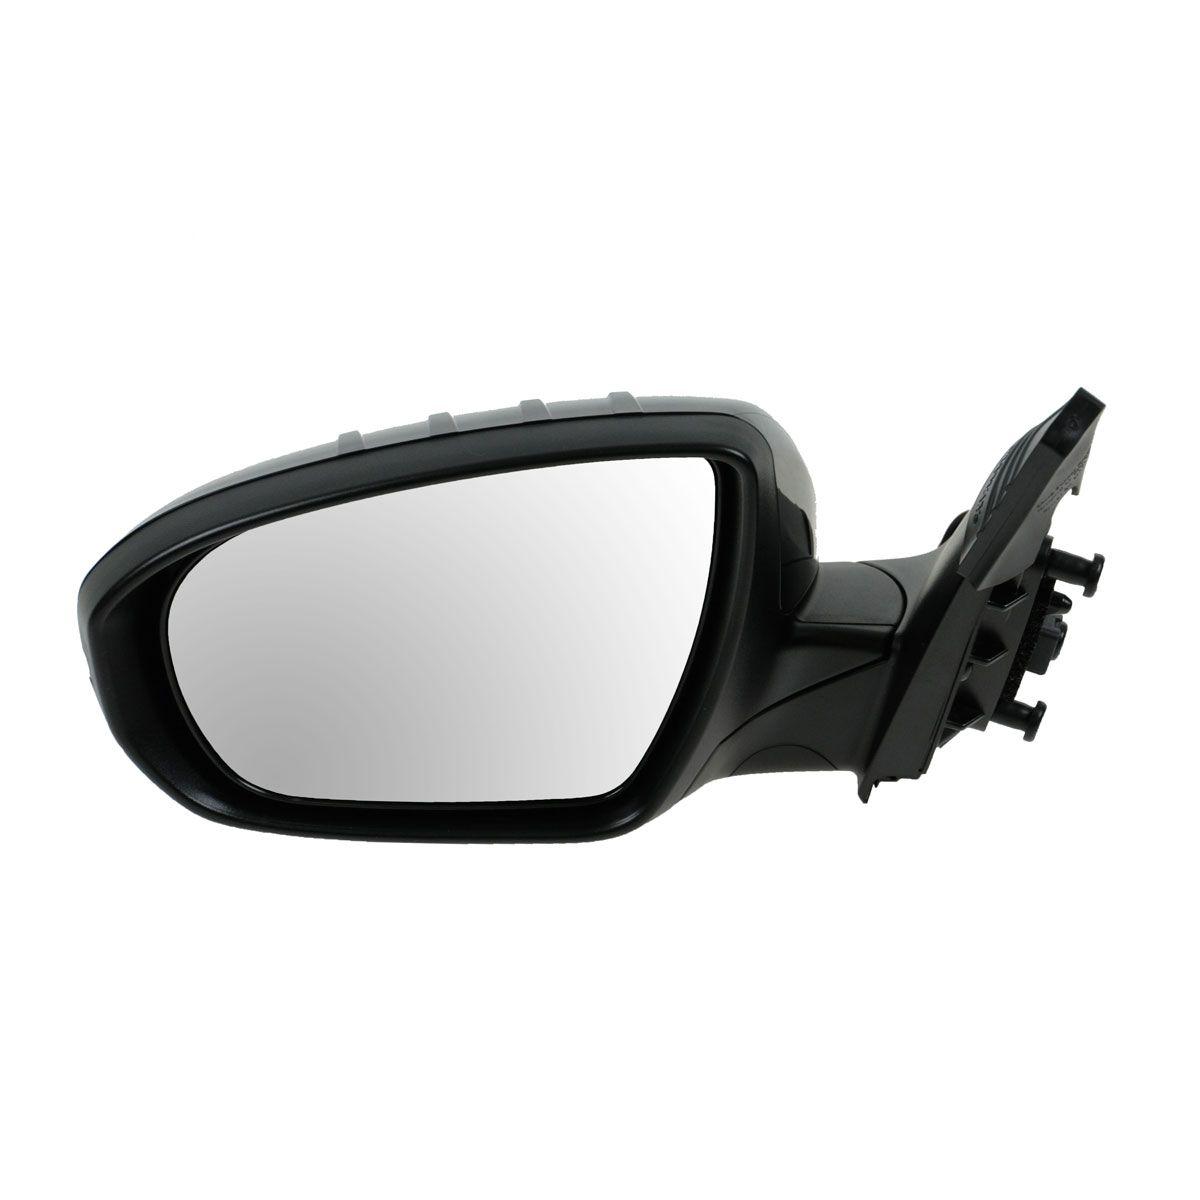 For Kia Optima Front,Left Driver Side DOOR MIRROR KI1320152 New 876102T110